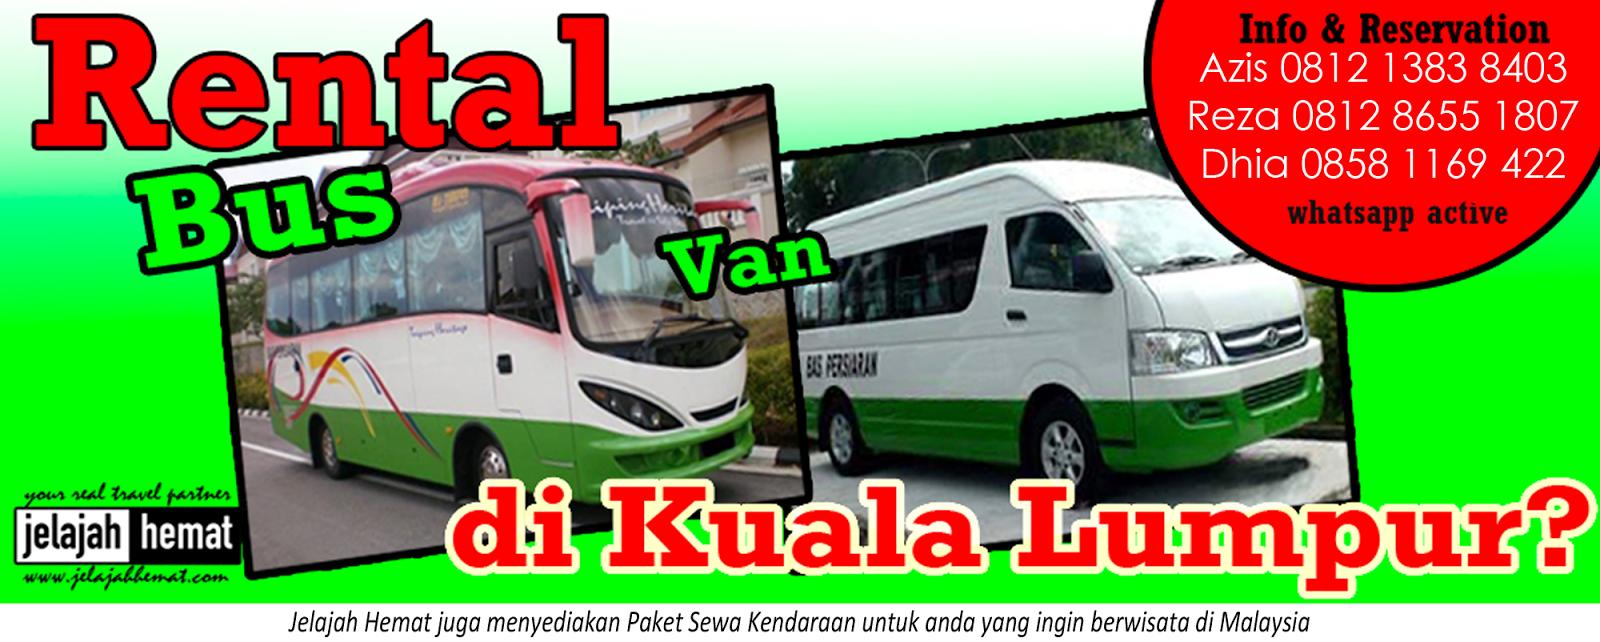 Sewa Bus Van Di Malaysia Terpercaya Paket Wisata Paket